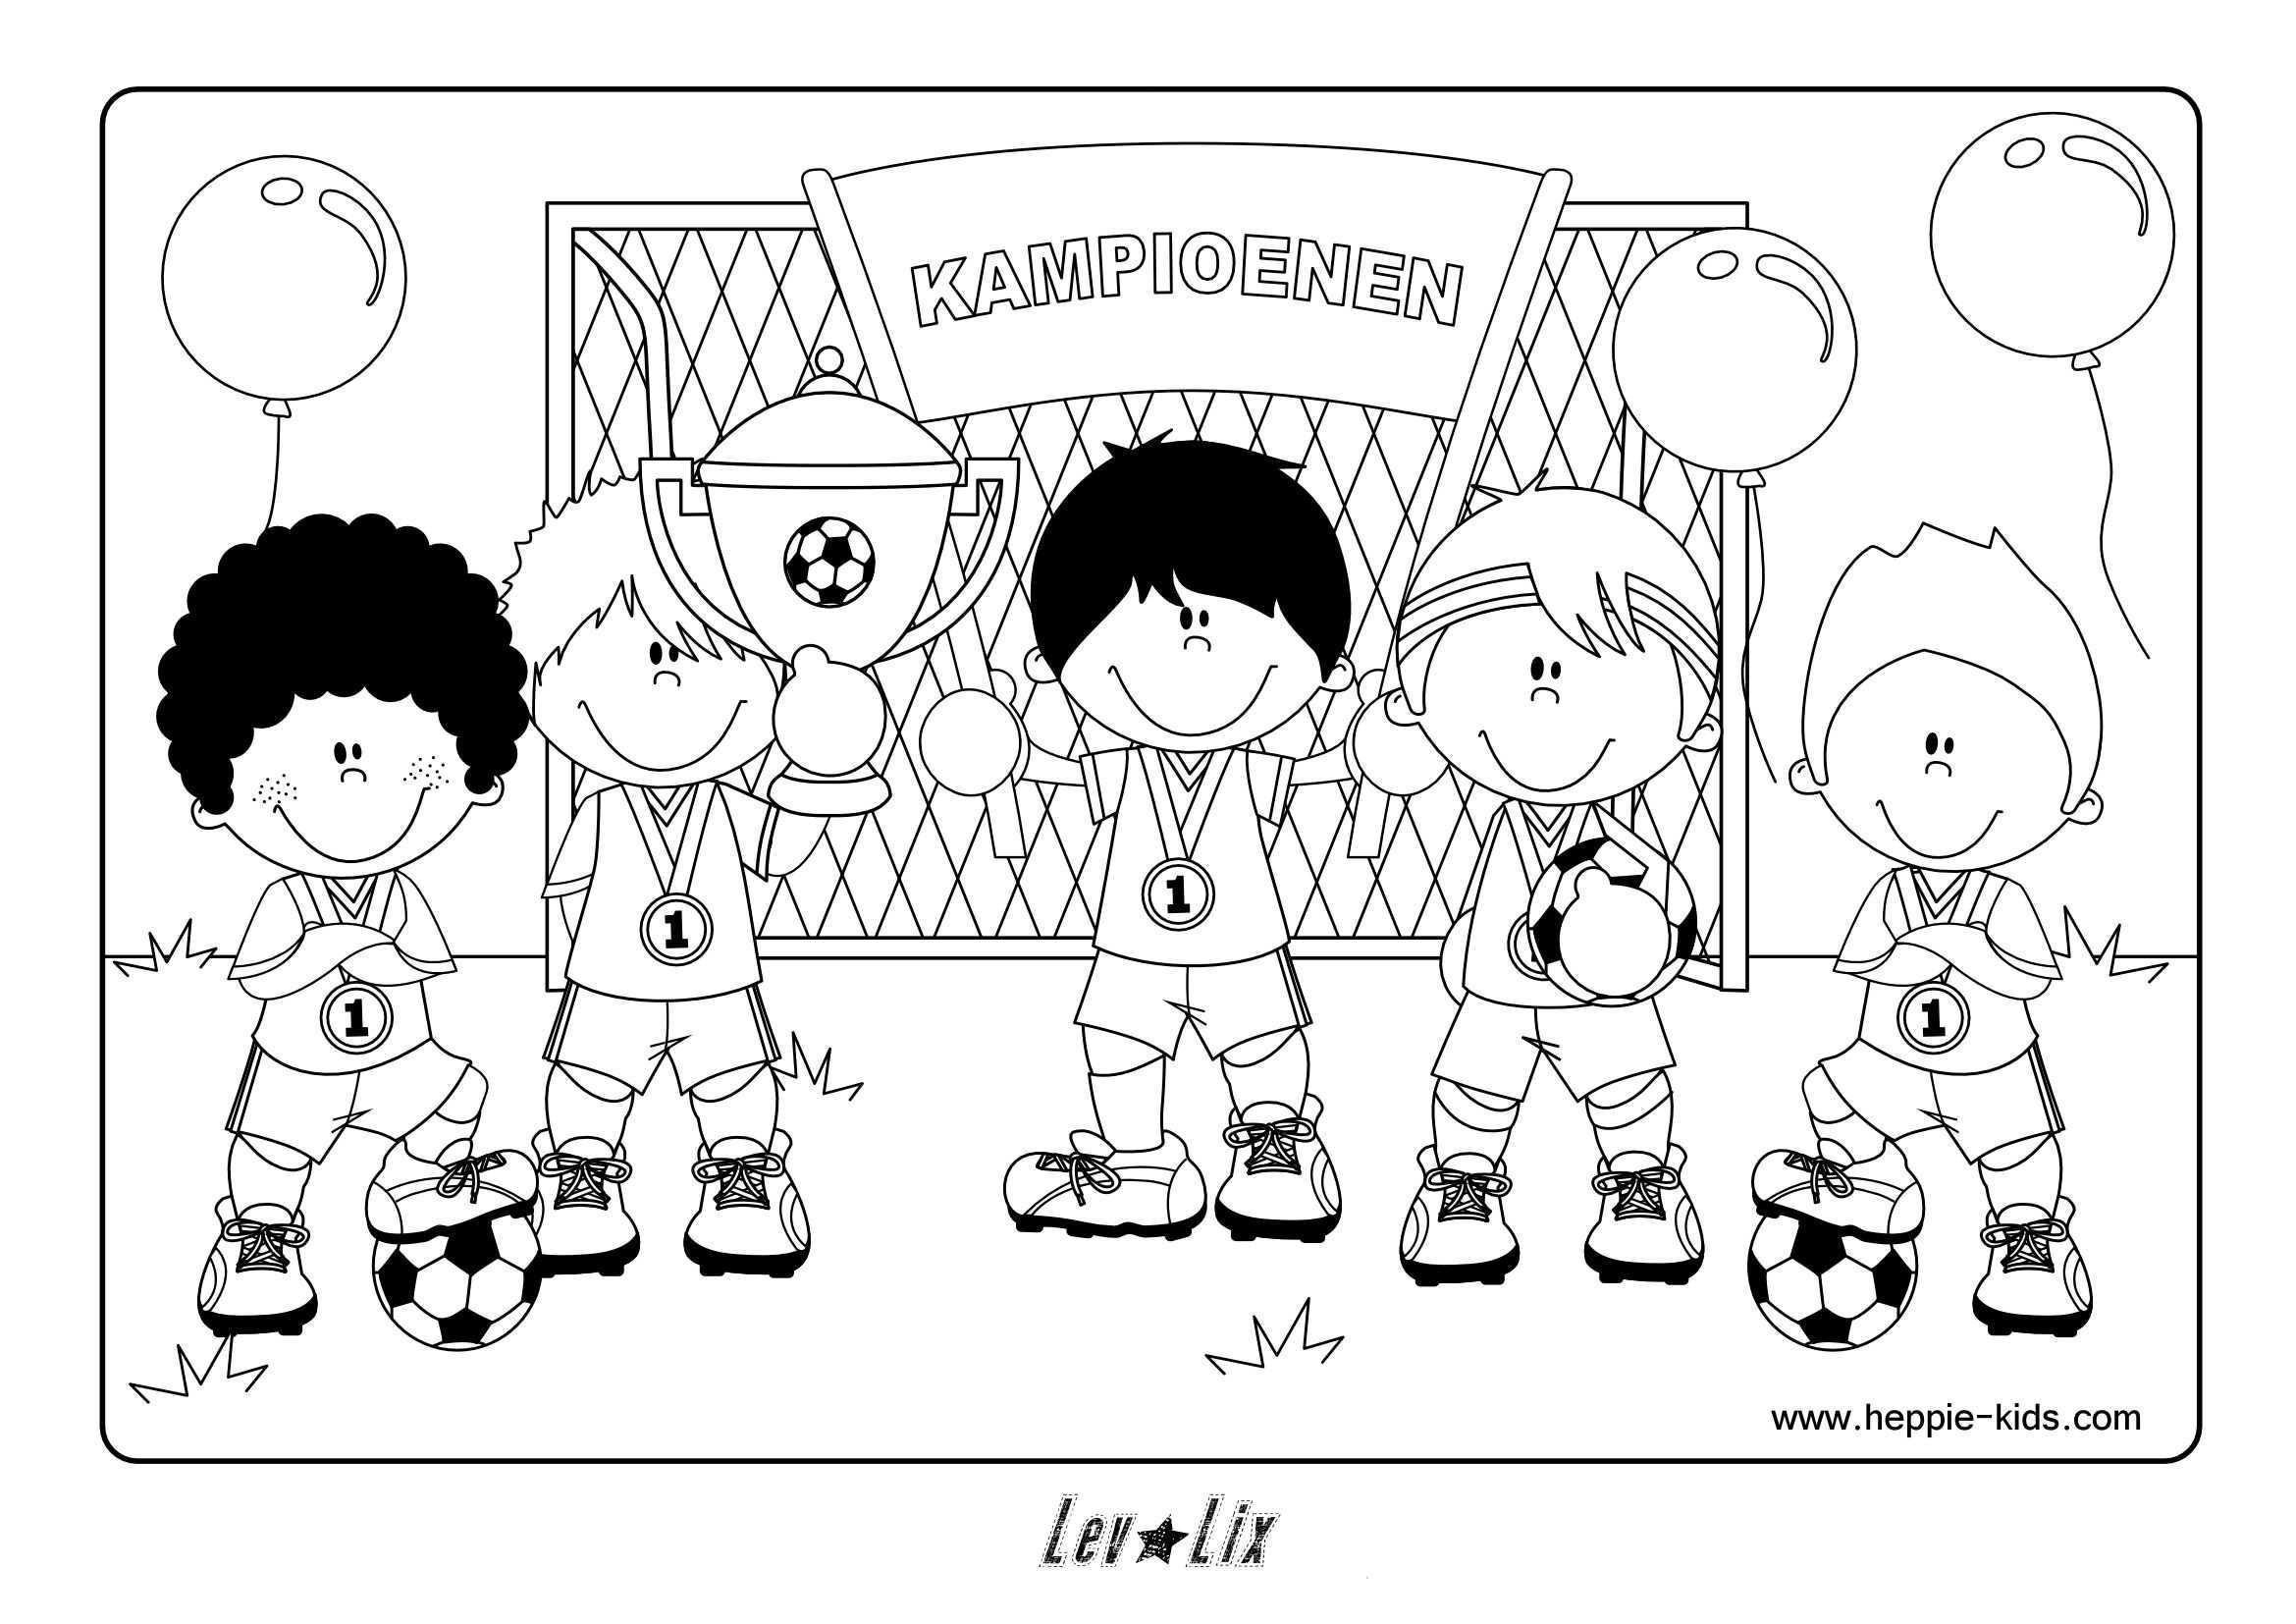 Kleurplaat Voetbal Www Heppie Kids Com Voetbal Kleurplaten Sport